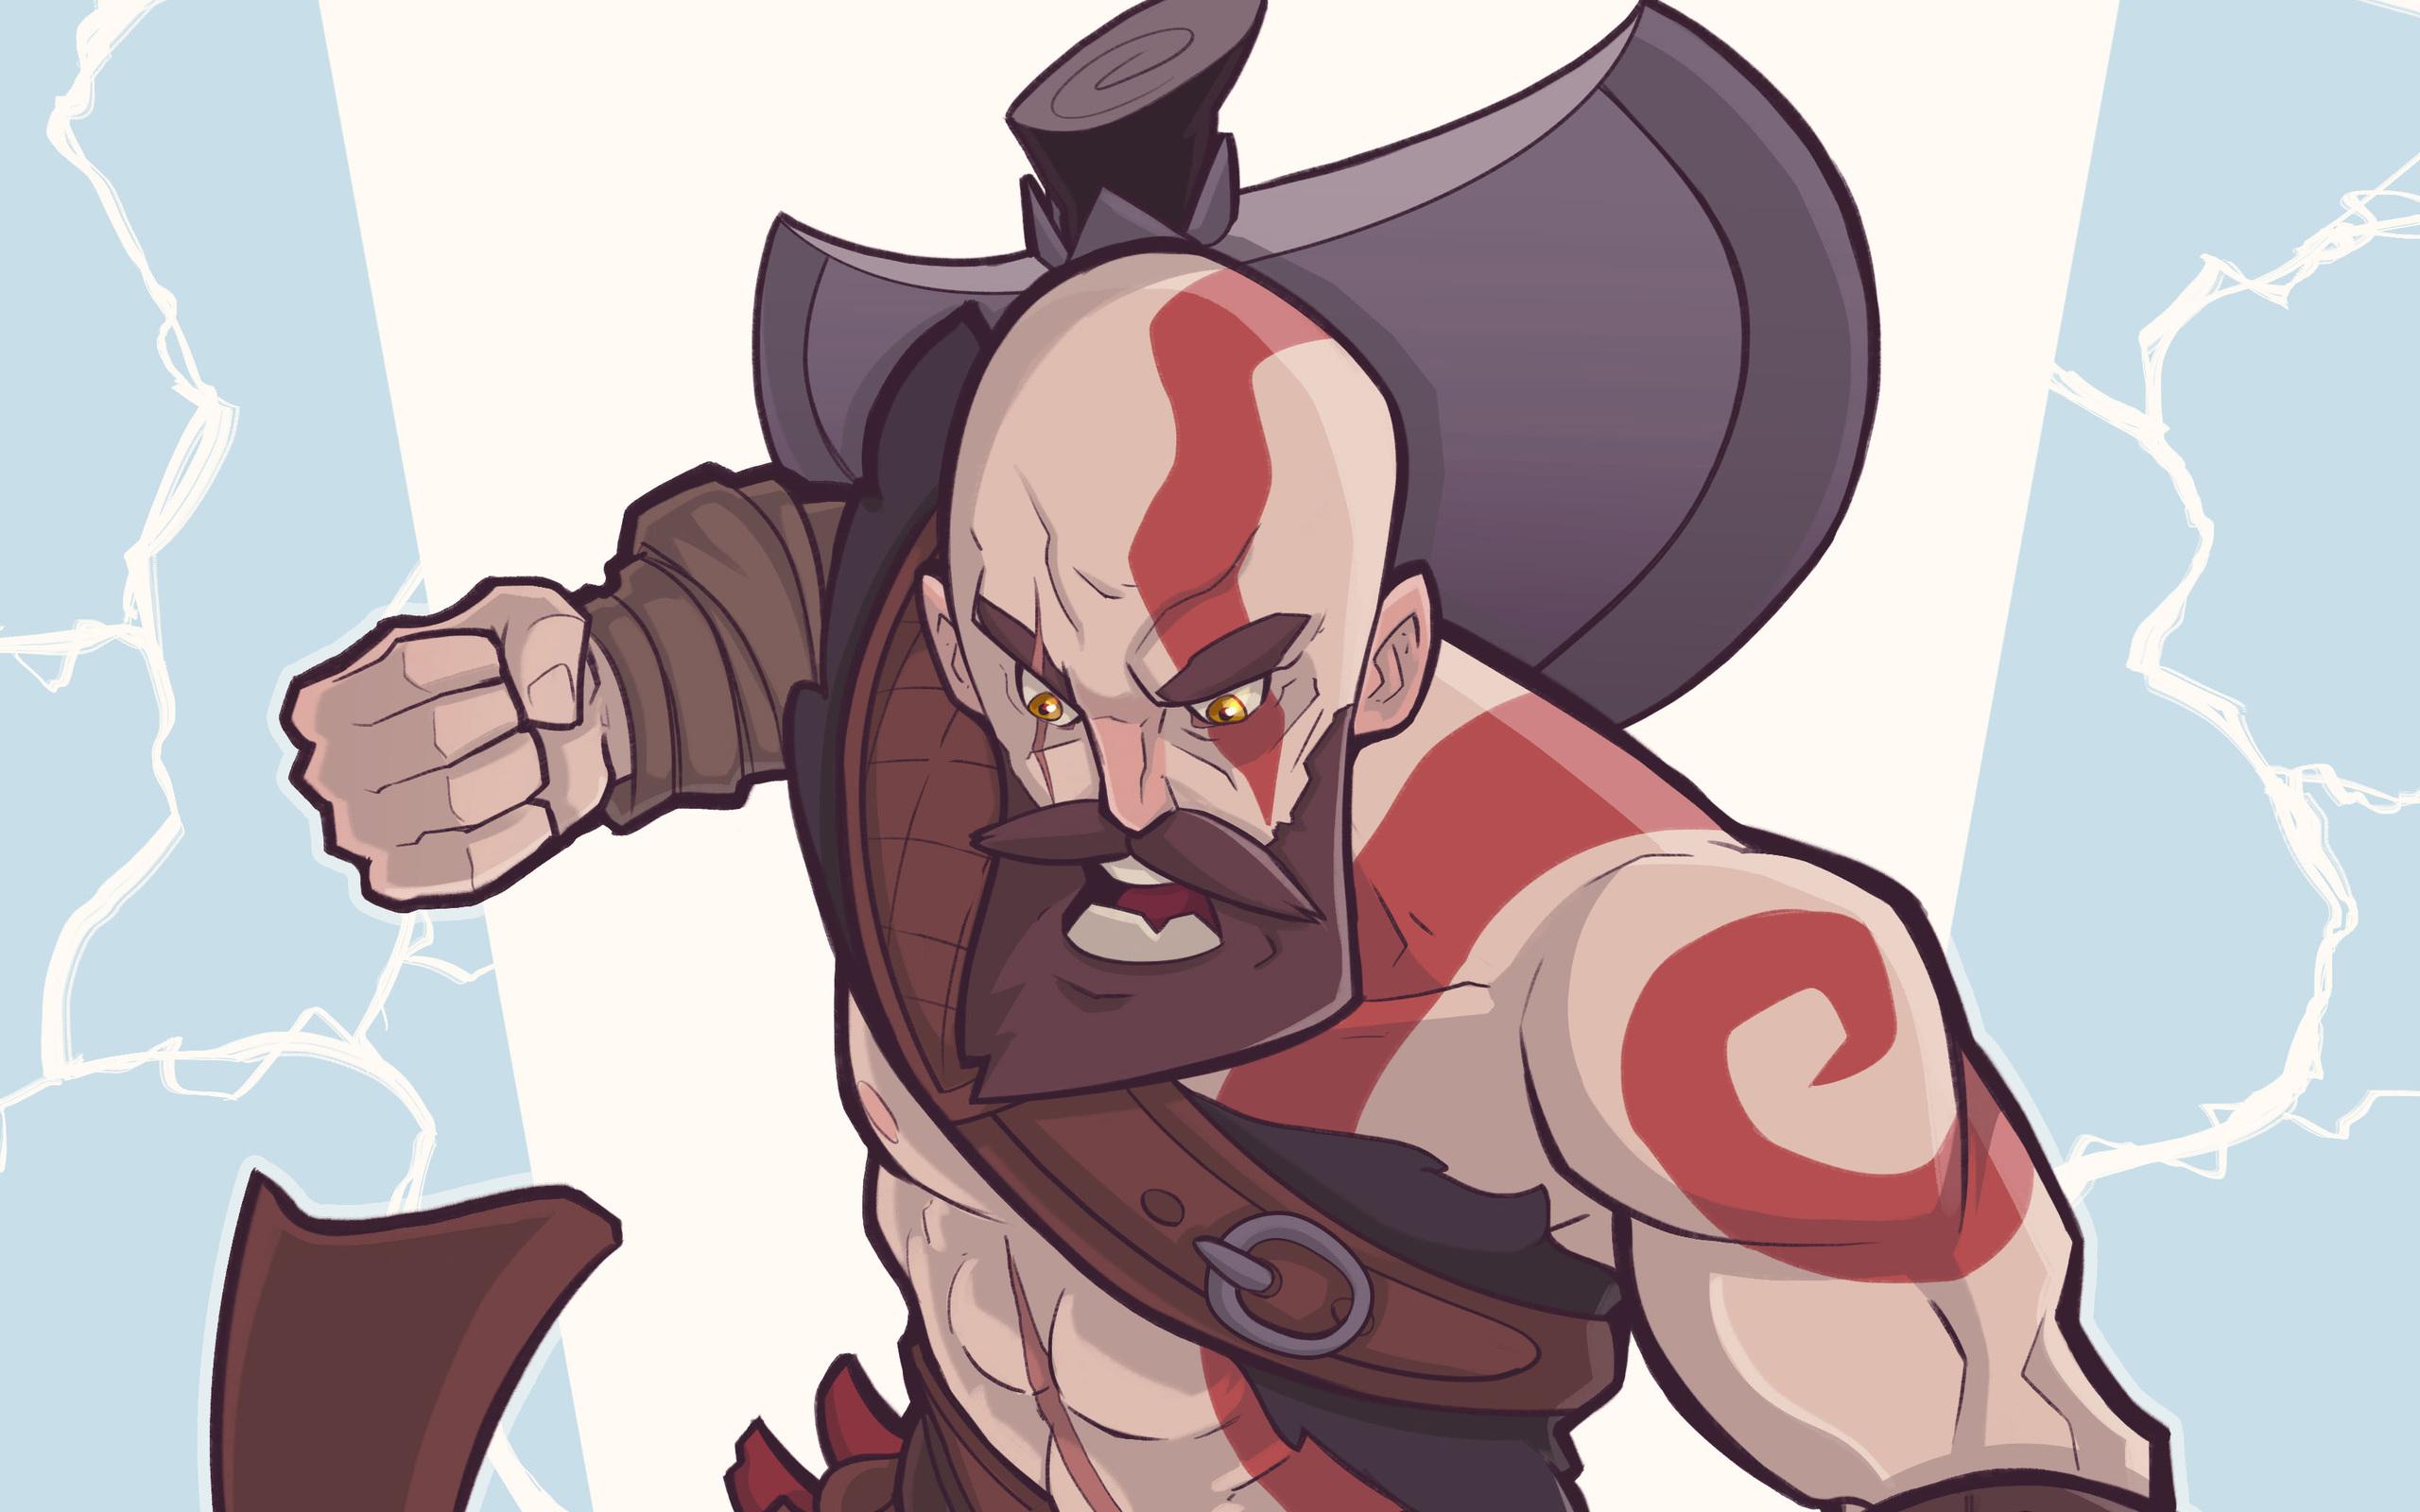 kratos-god-of-war-digital-art-4k-nd.jpg